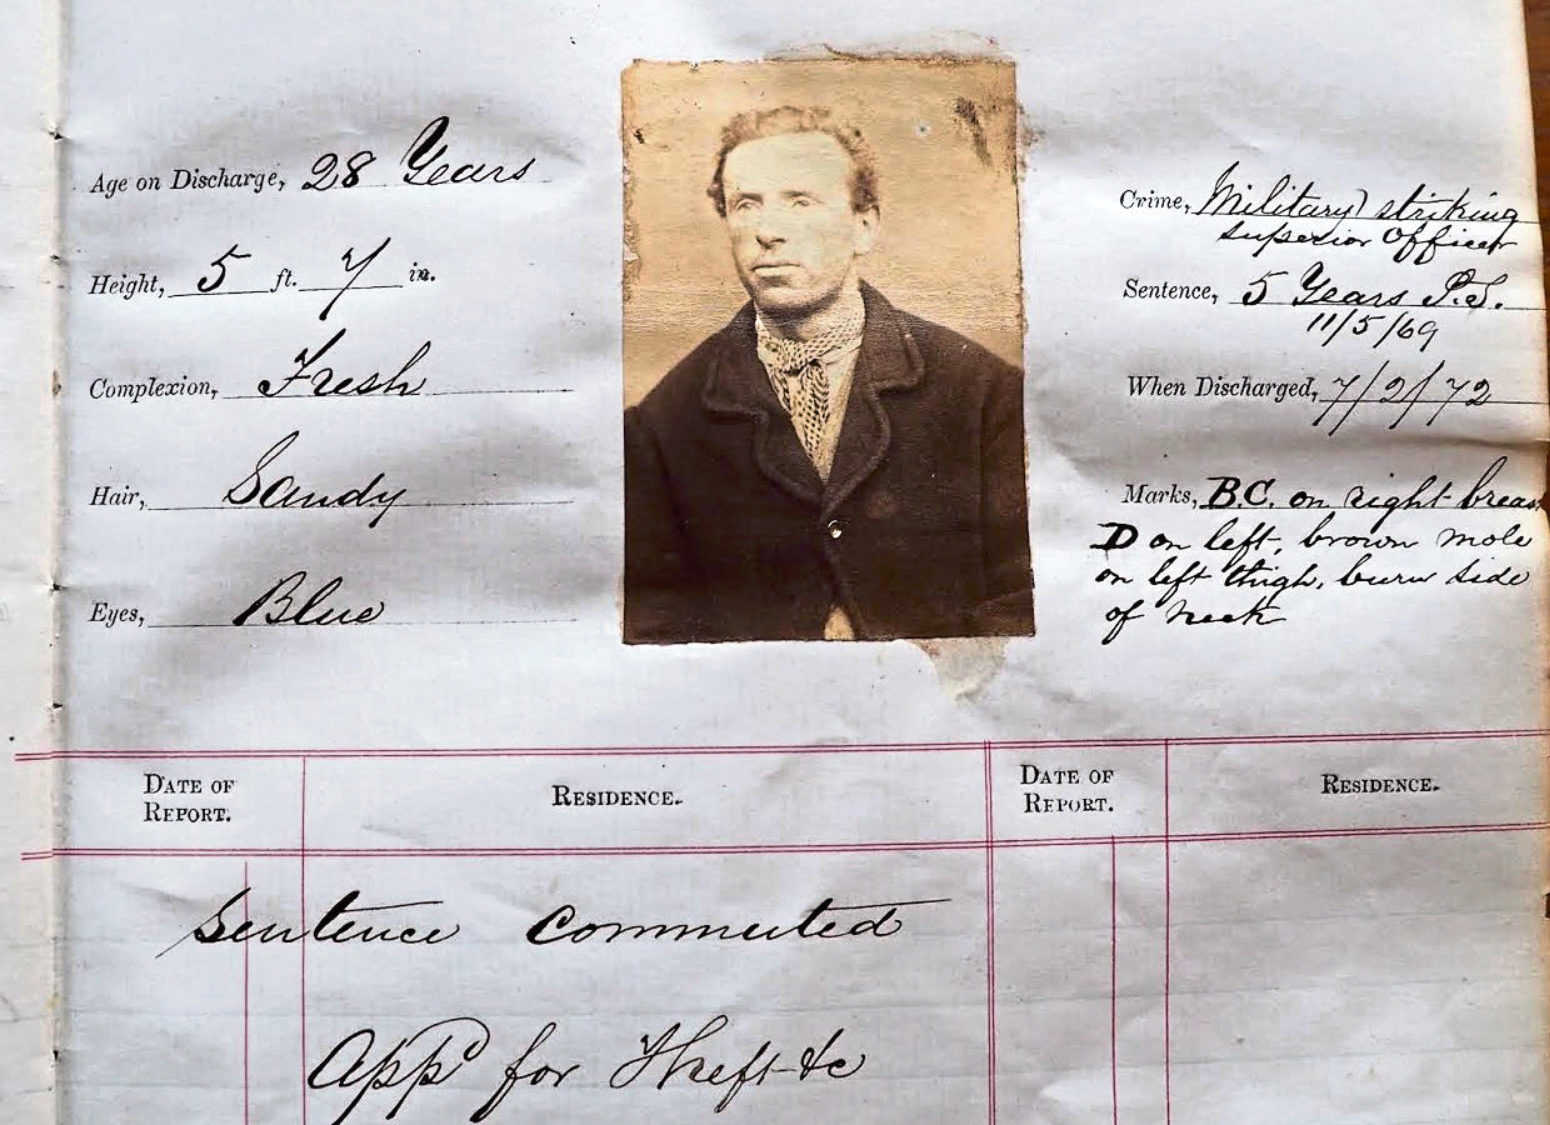 Robert Sanderson was sentenced to five years